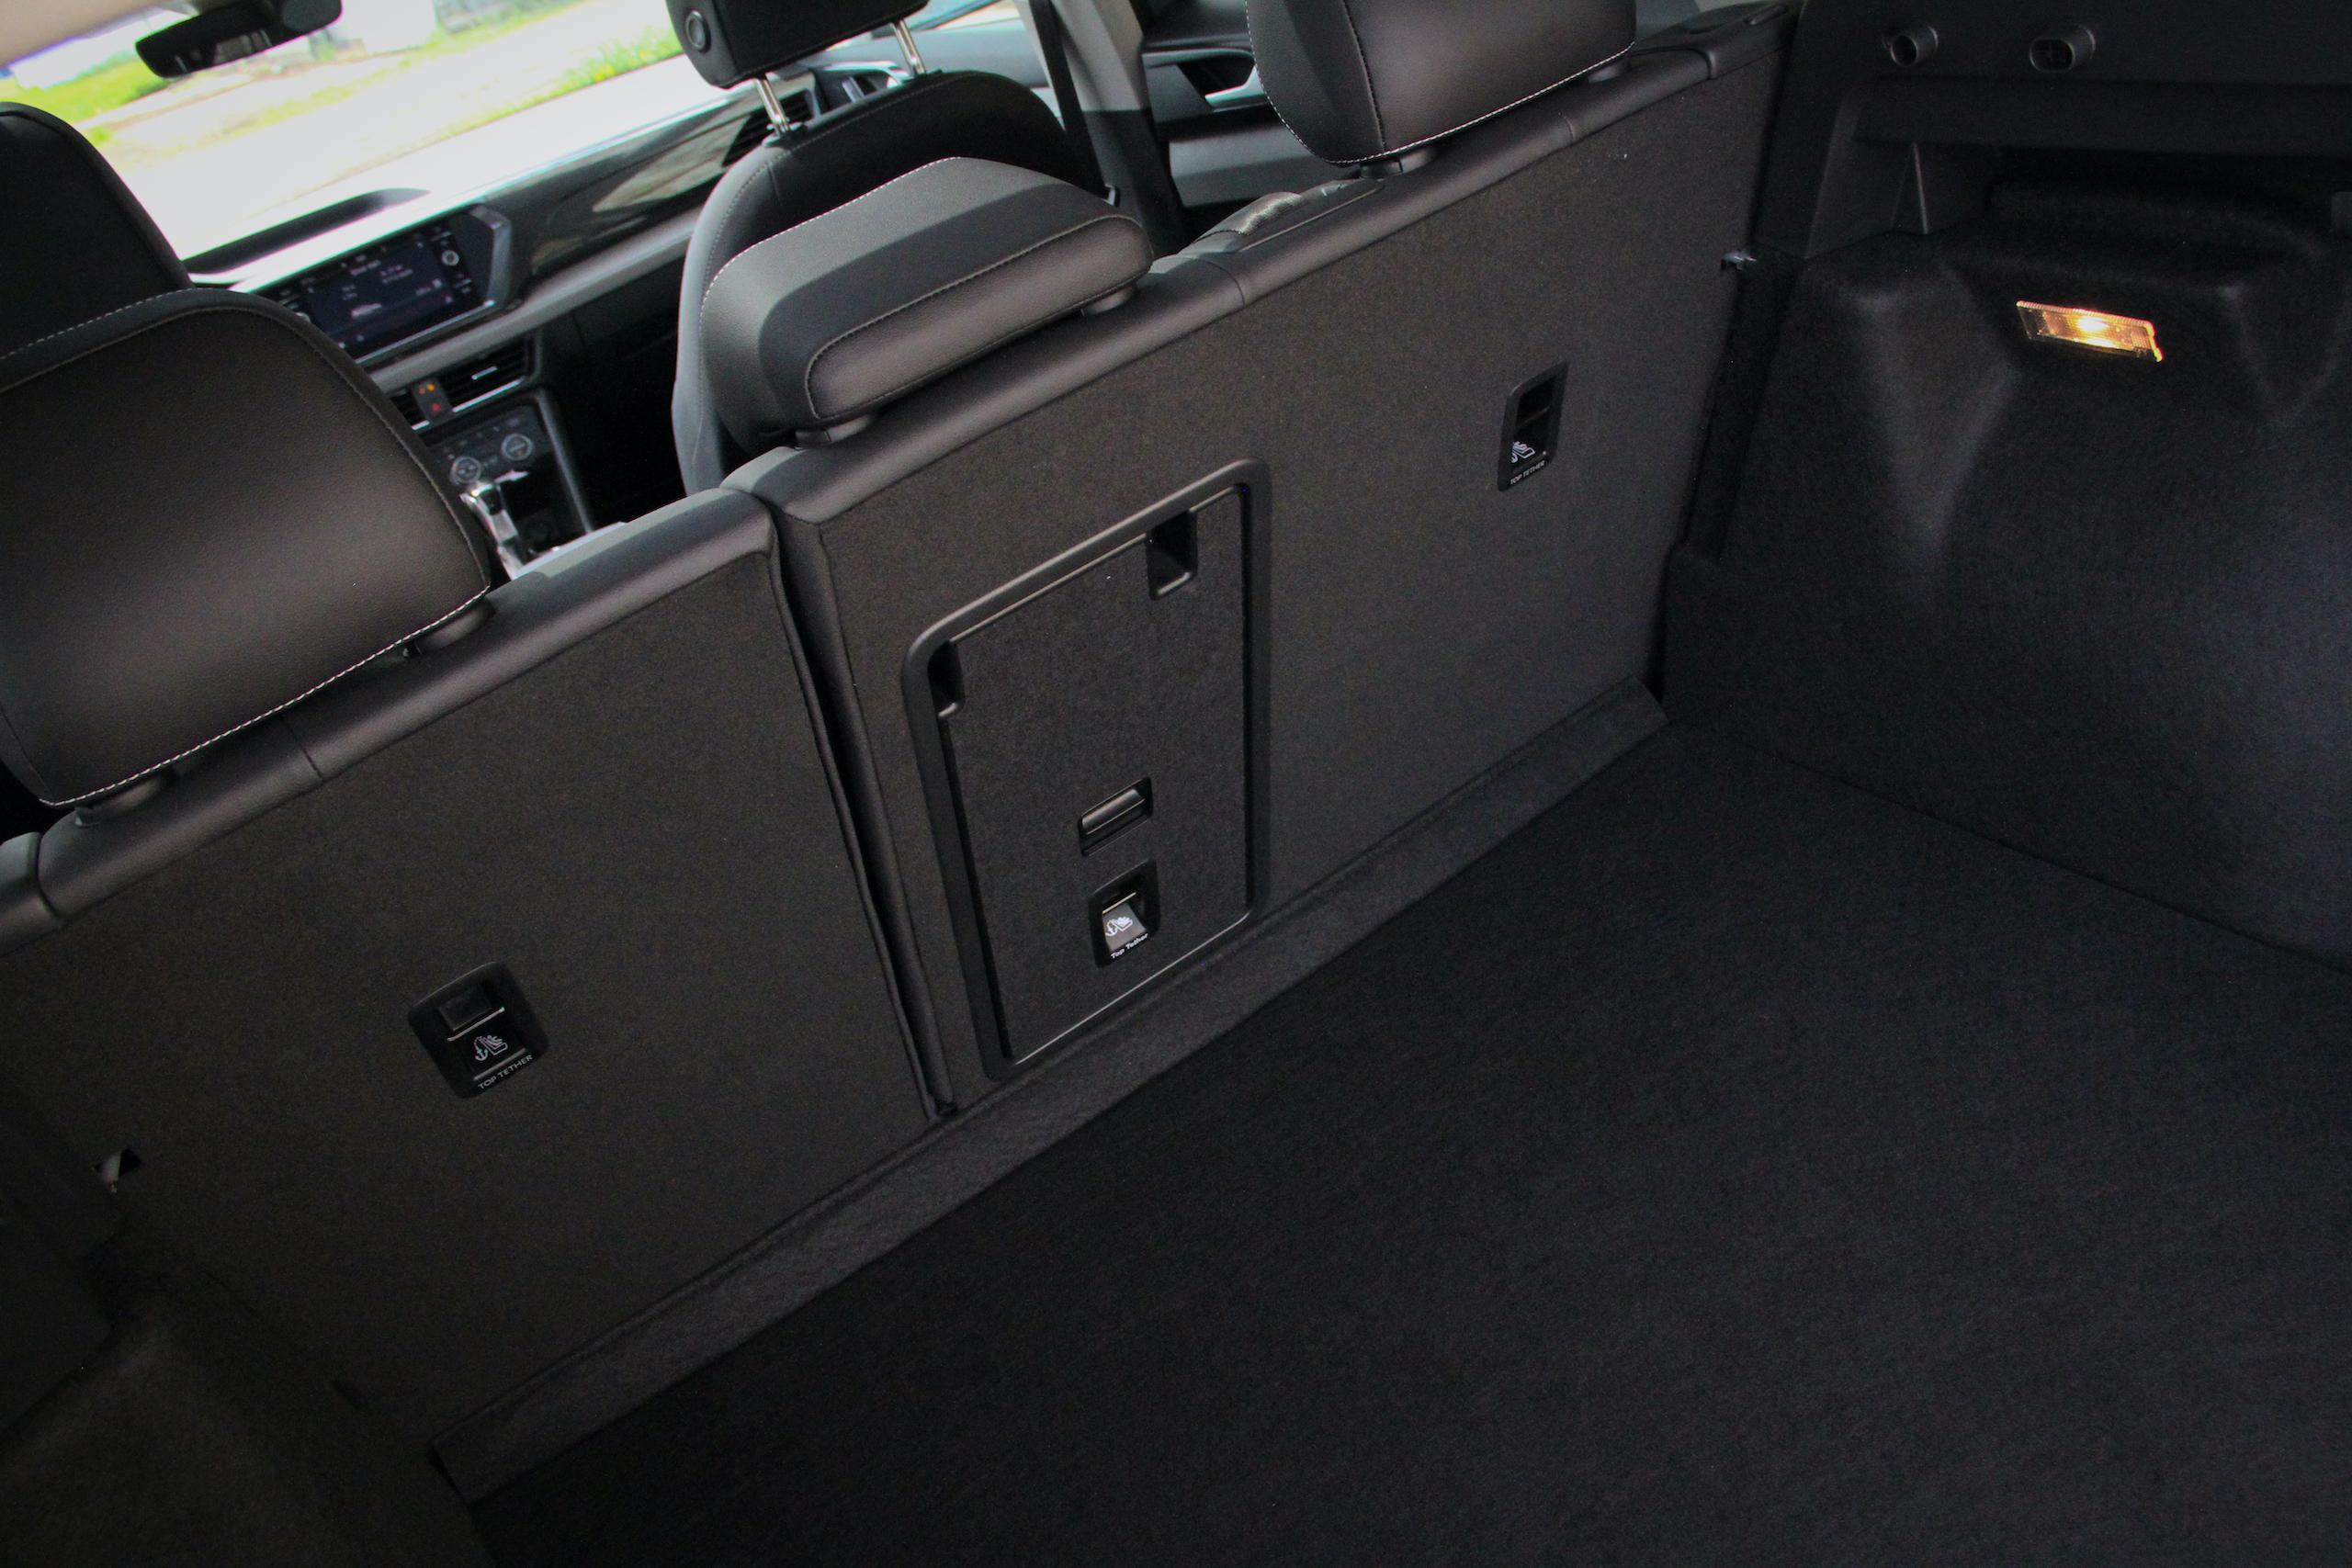 2022 Volkswagen Taos SEL AWD rear cargo space